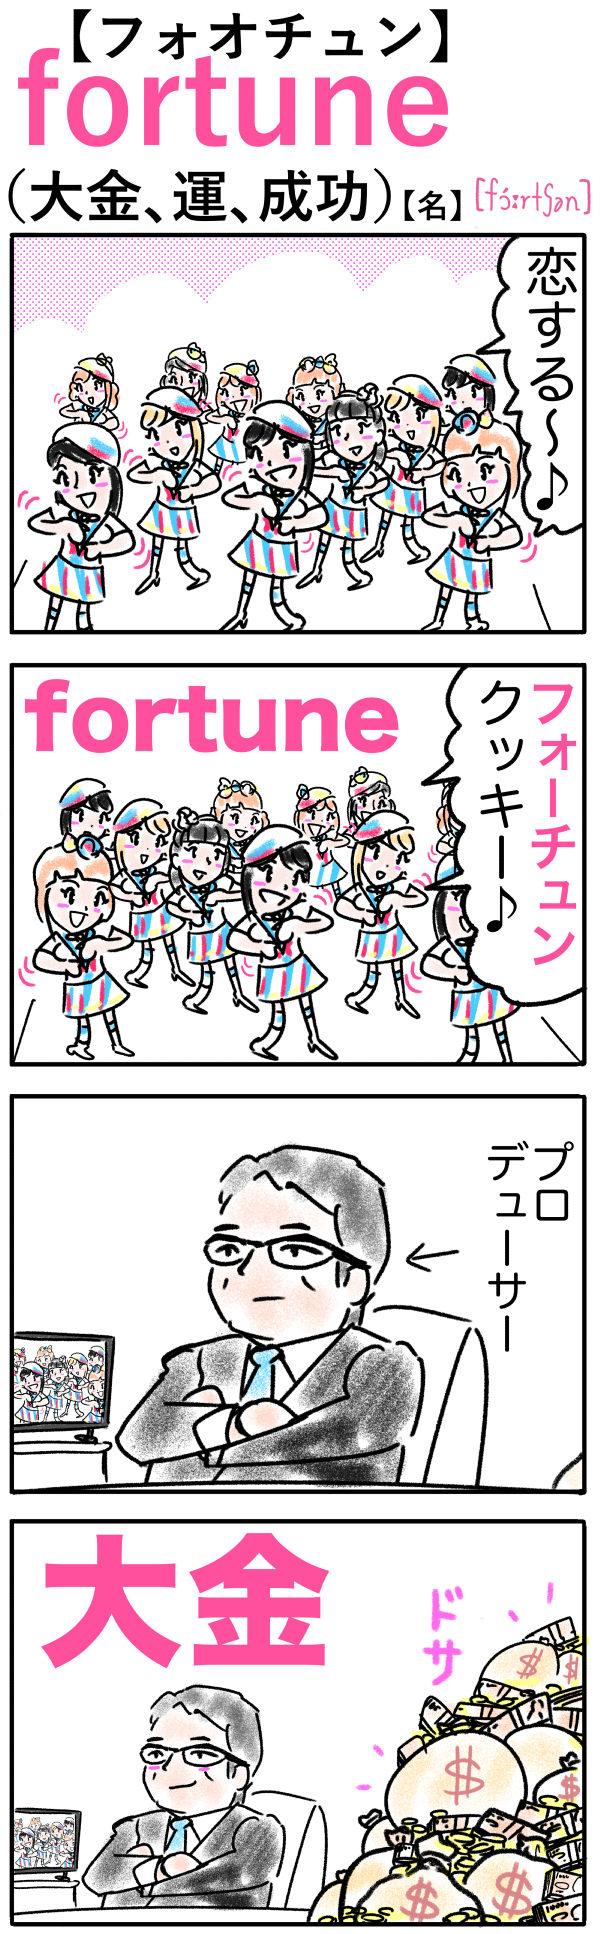 fortune(大金)の語呂合わせ英単語